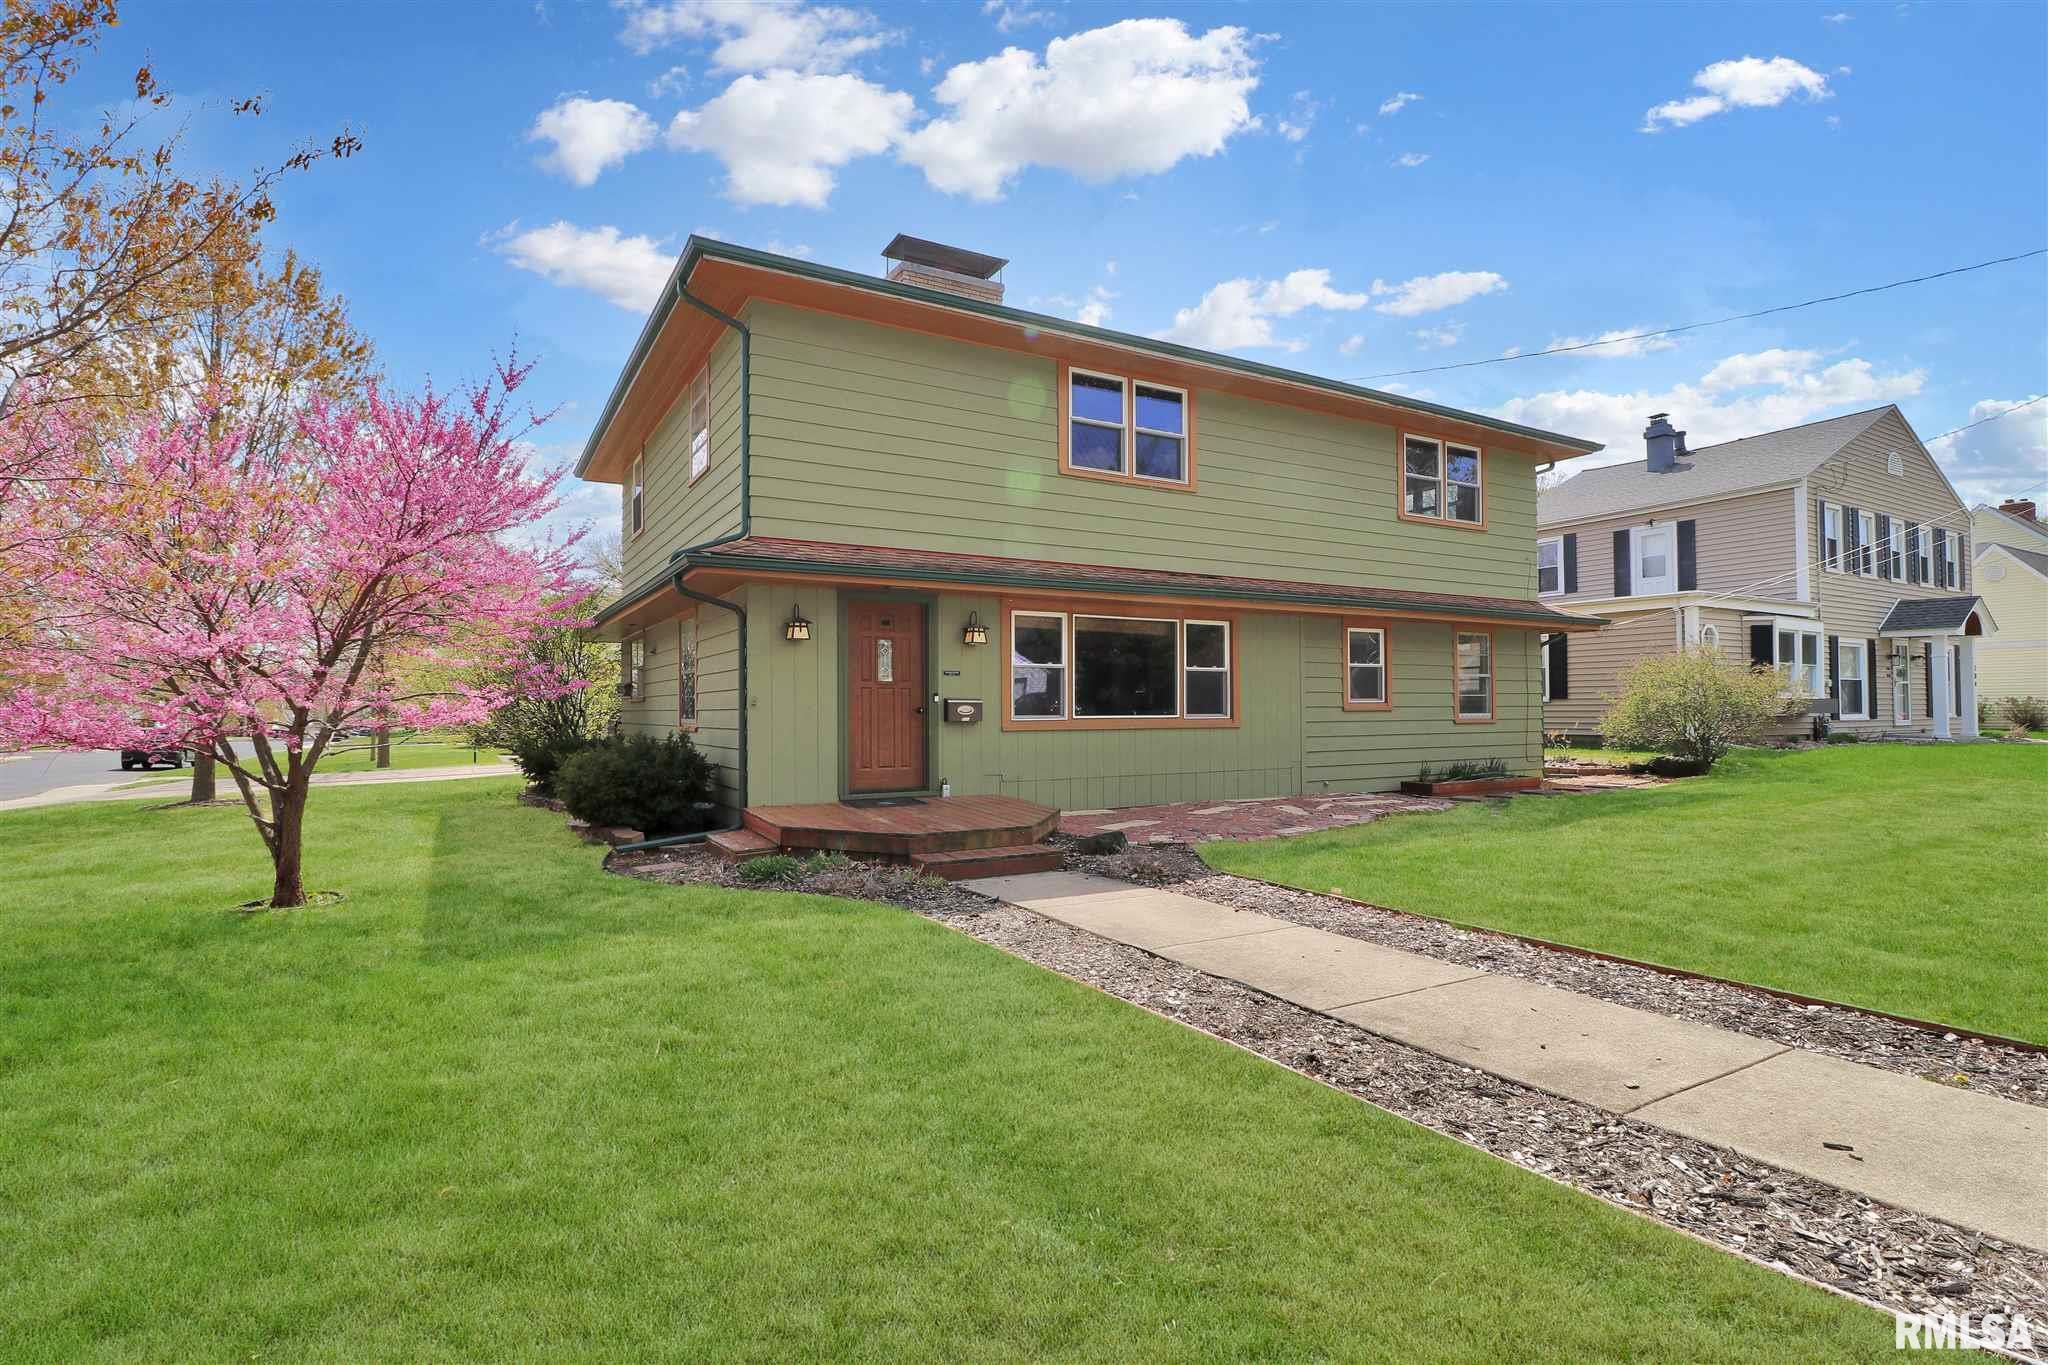 210 E ORCHARD Property Photo - Peoria, IL real estate listing